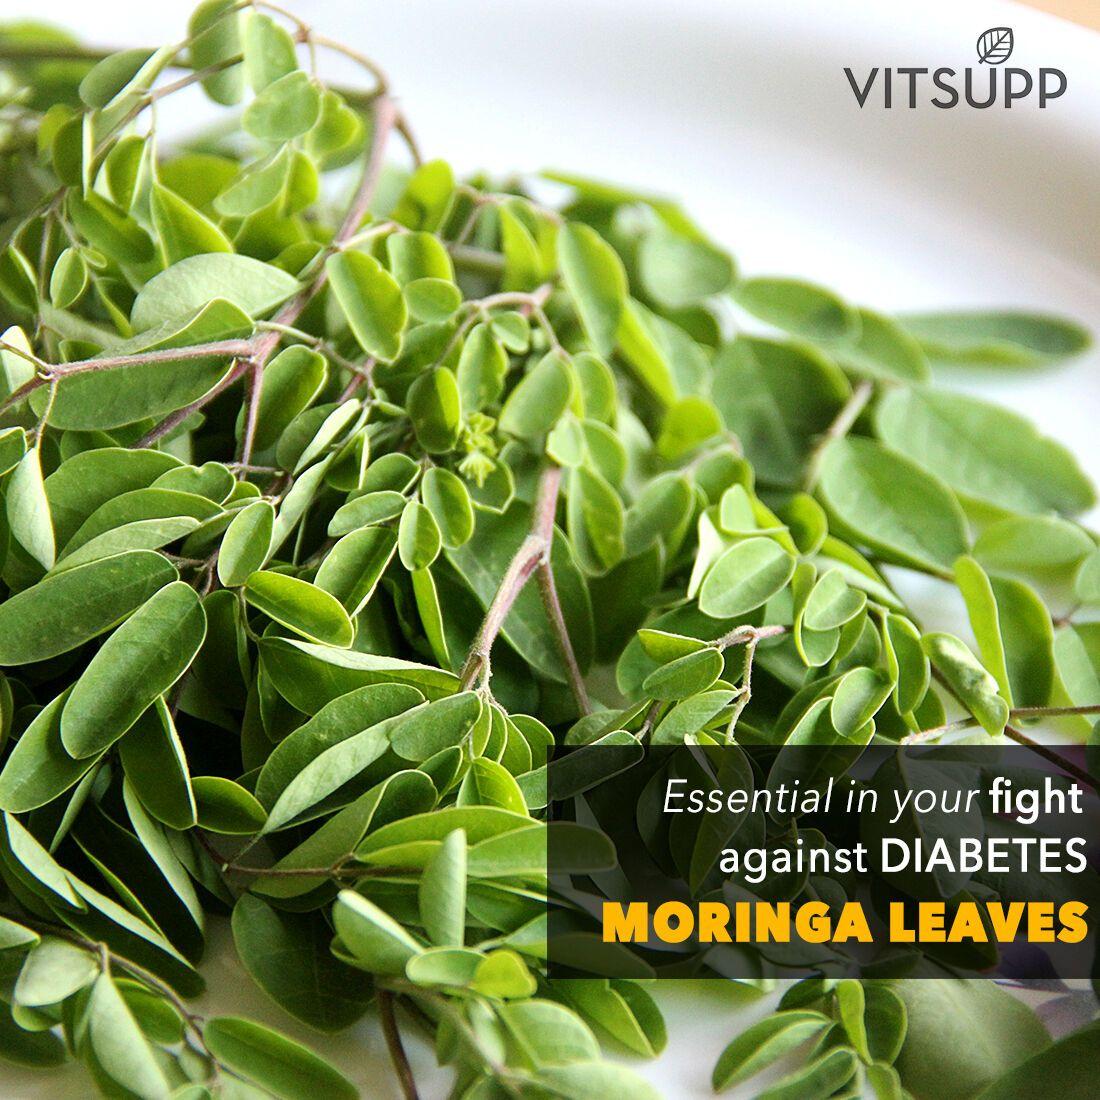 Drumstick Leaves Flowers Seeds Health Benefits And Side Effects In 2020 Moringa Leaf Powder Moringa Moringa Leaves